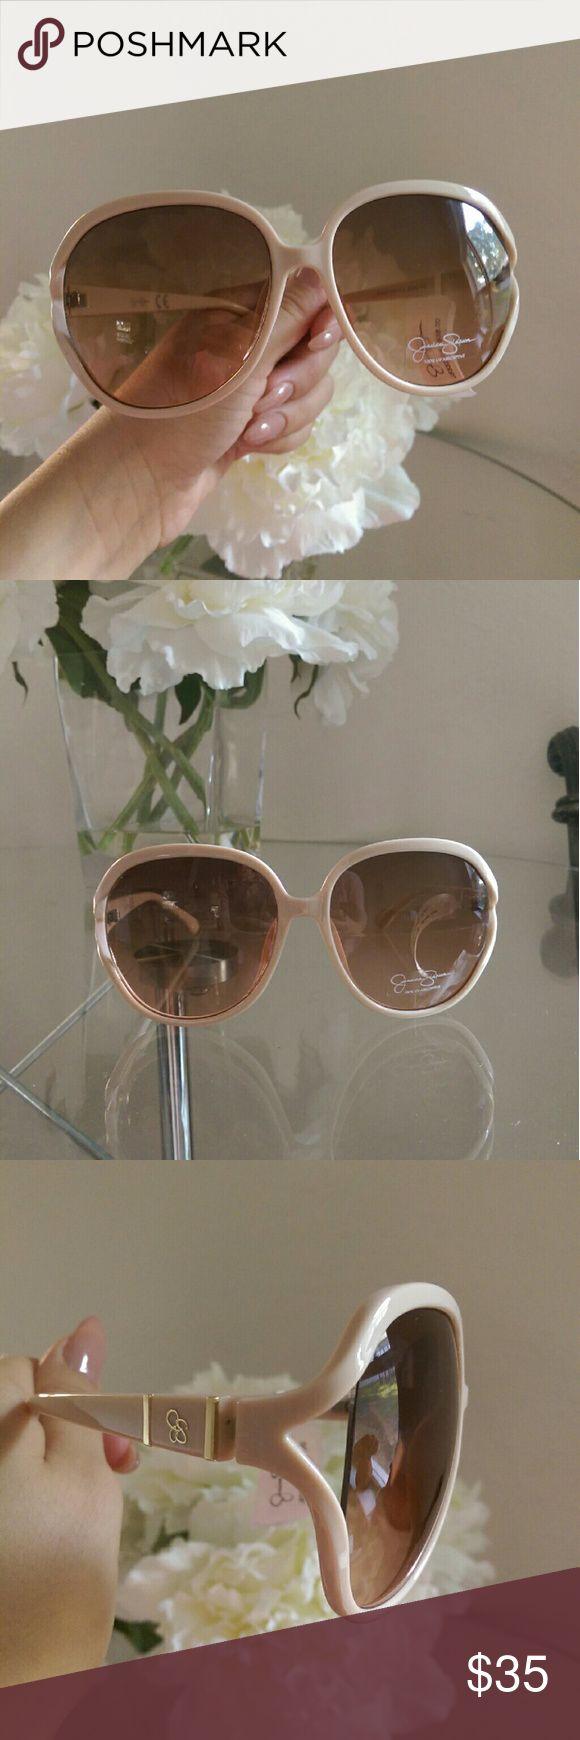 New Jessica Simpson Sunglasses New never worn. Jessica Simpson Sunglasses Jessica Simpson  Accessories Sunglasses